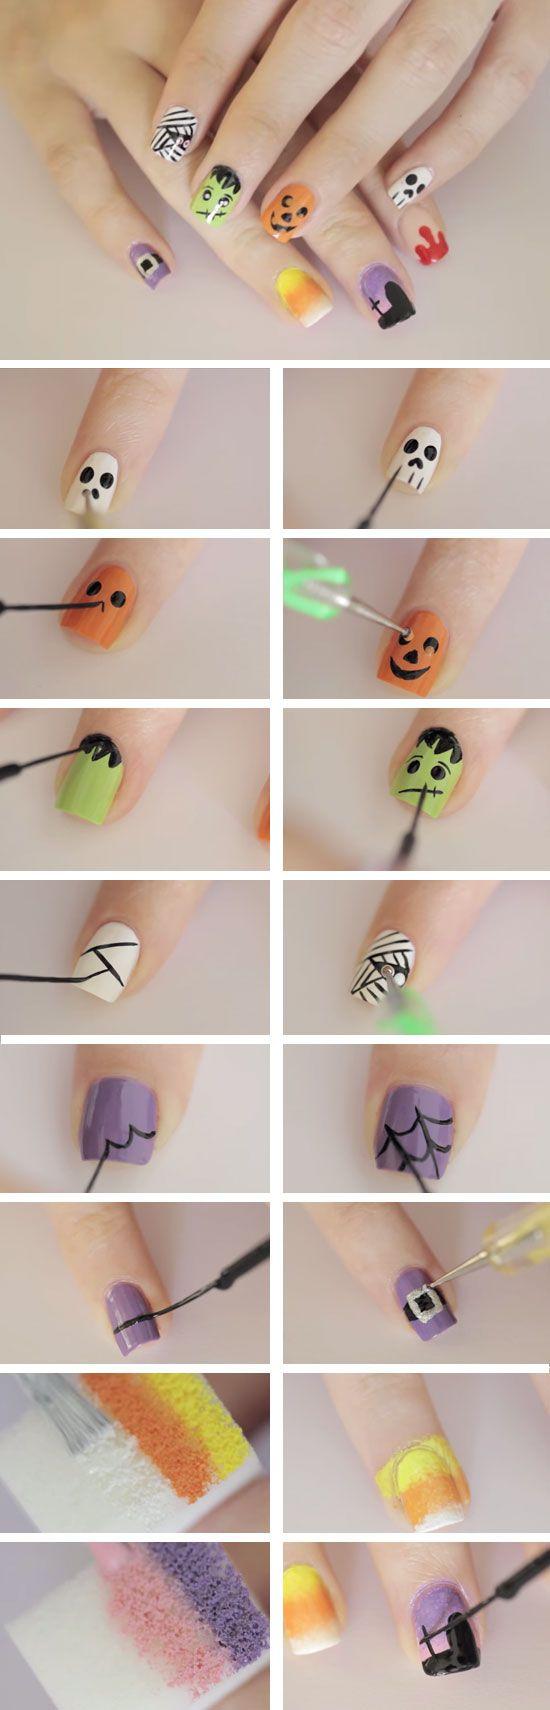 Diy Halloween Nail Art Designs You Can Try Yourself Halloween Nails Diy Halloween Nail Designs Nail Art Diy